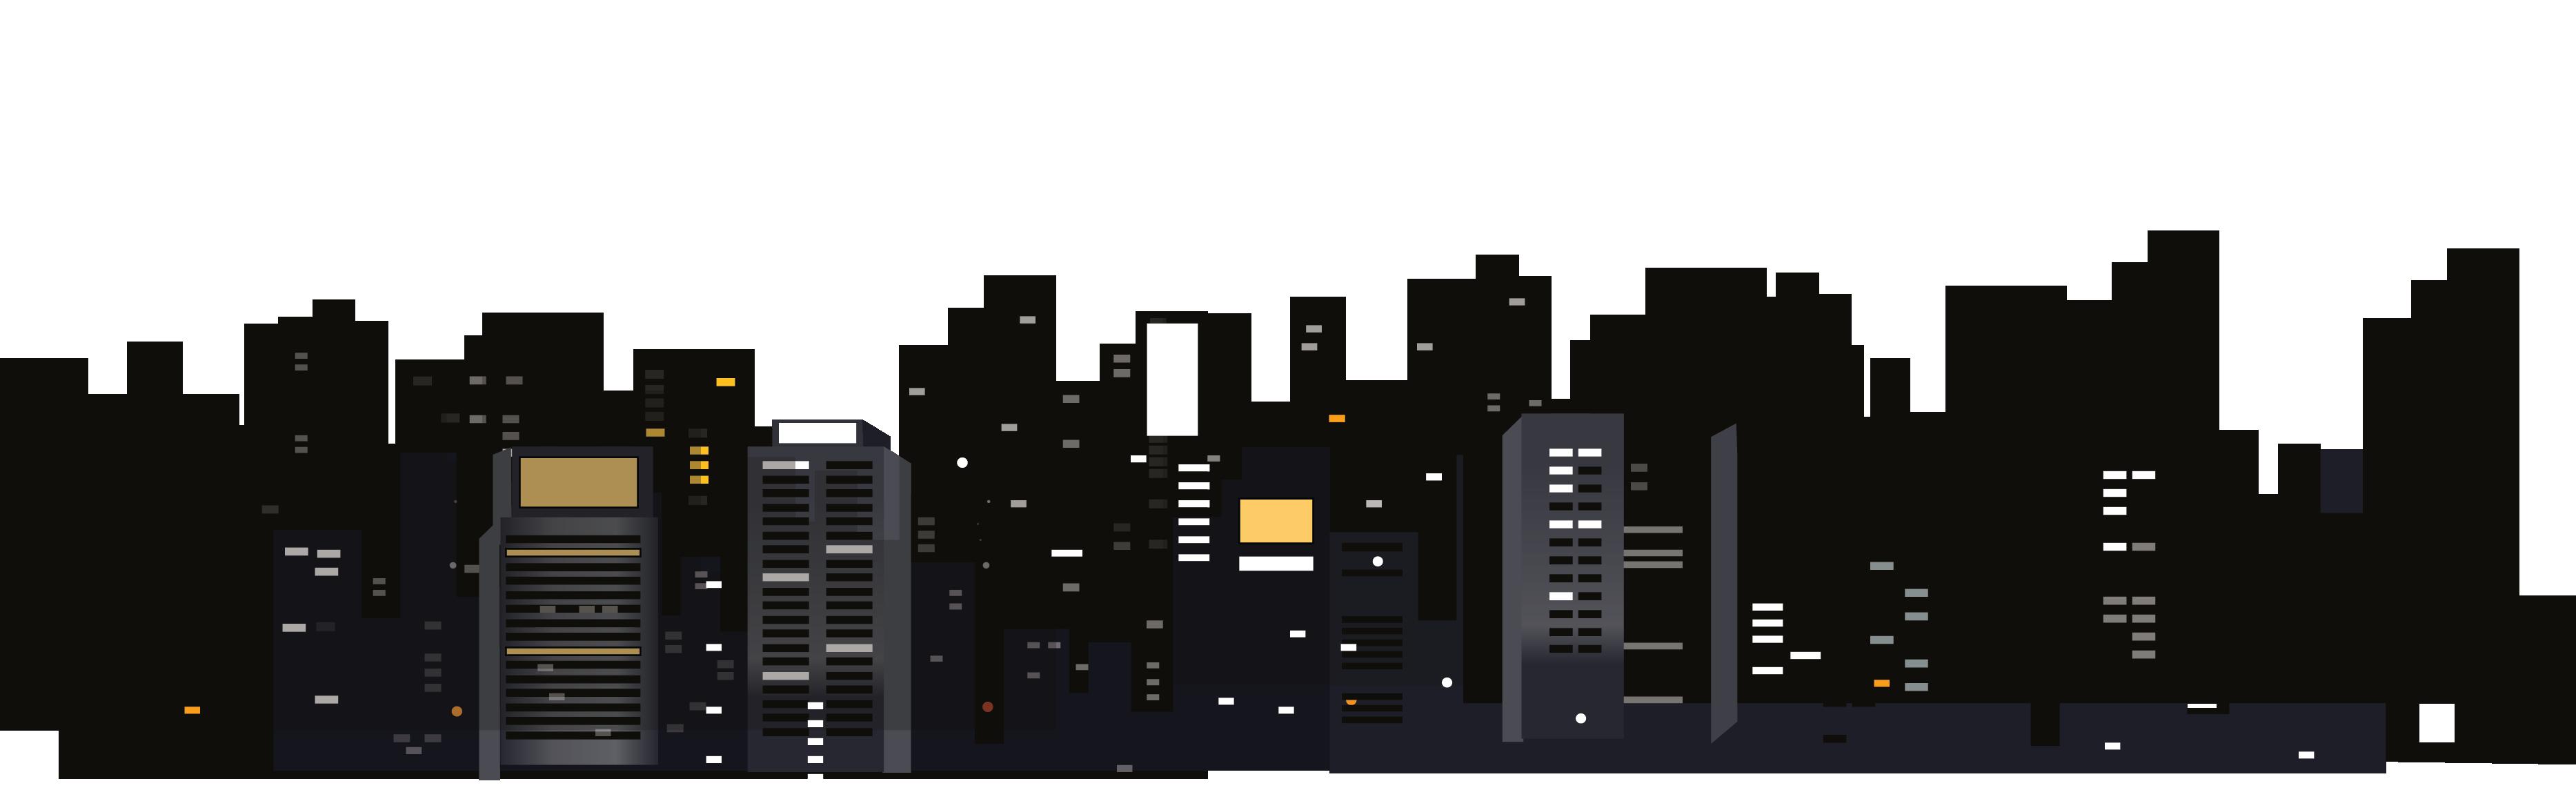 png free Building euclidean night sky. Urban vector city gurgaon